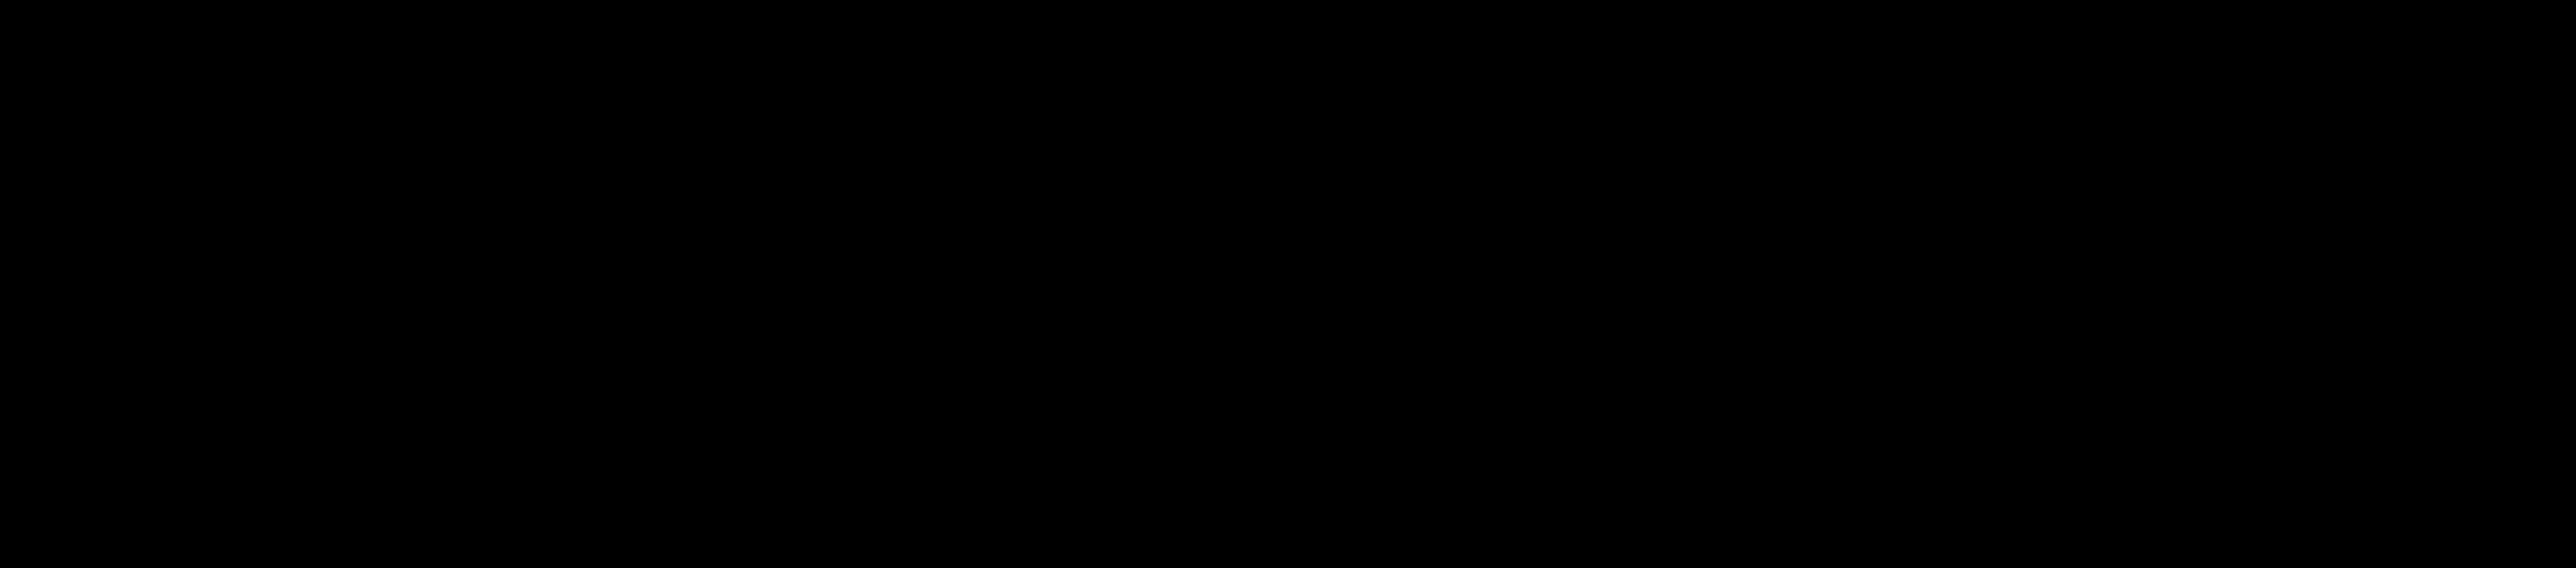 Di-O-(N-Boc)-glycinoylcurcumin